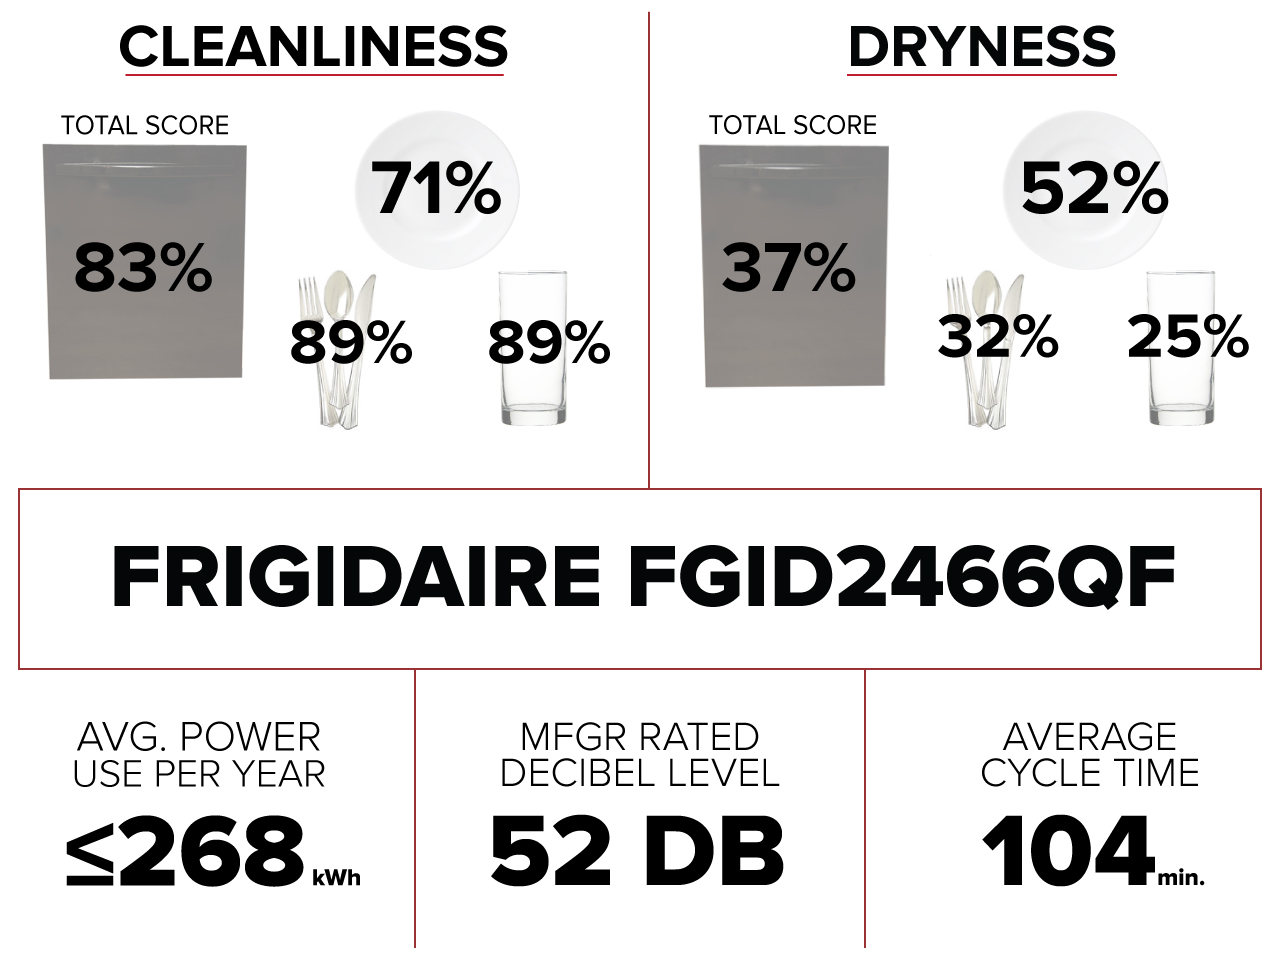 frigidaire-fgid2466qf-dishwasher-graphic.jpg